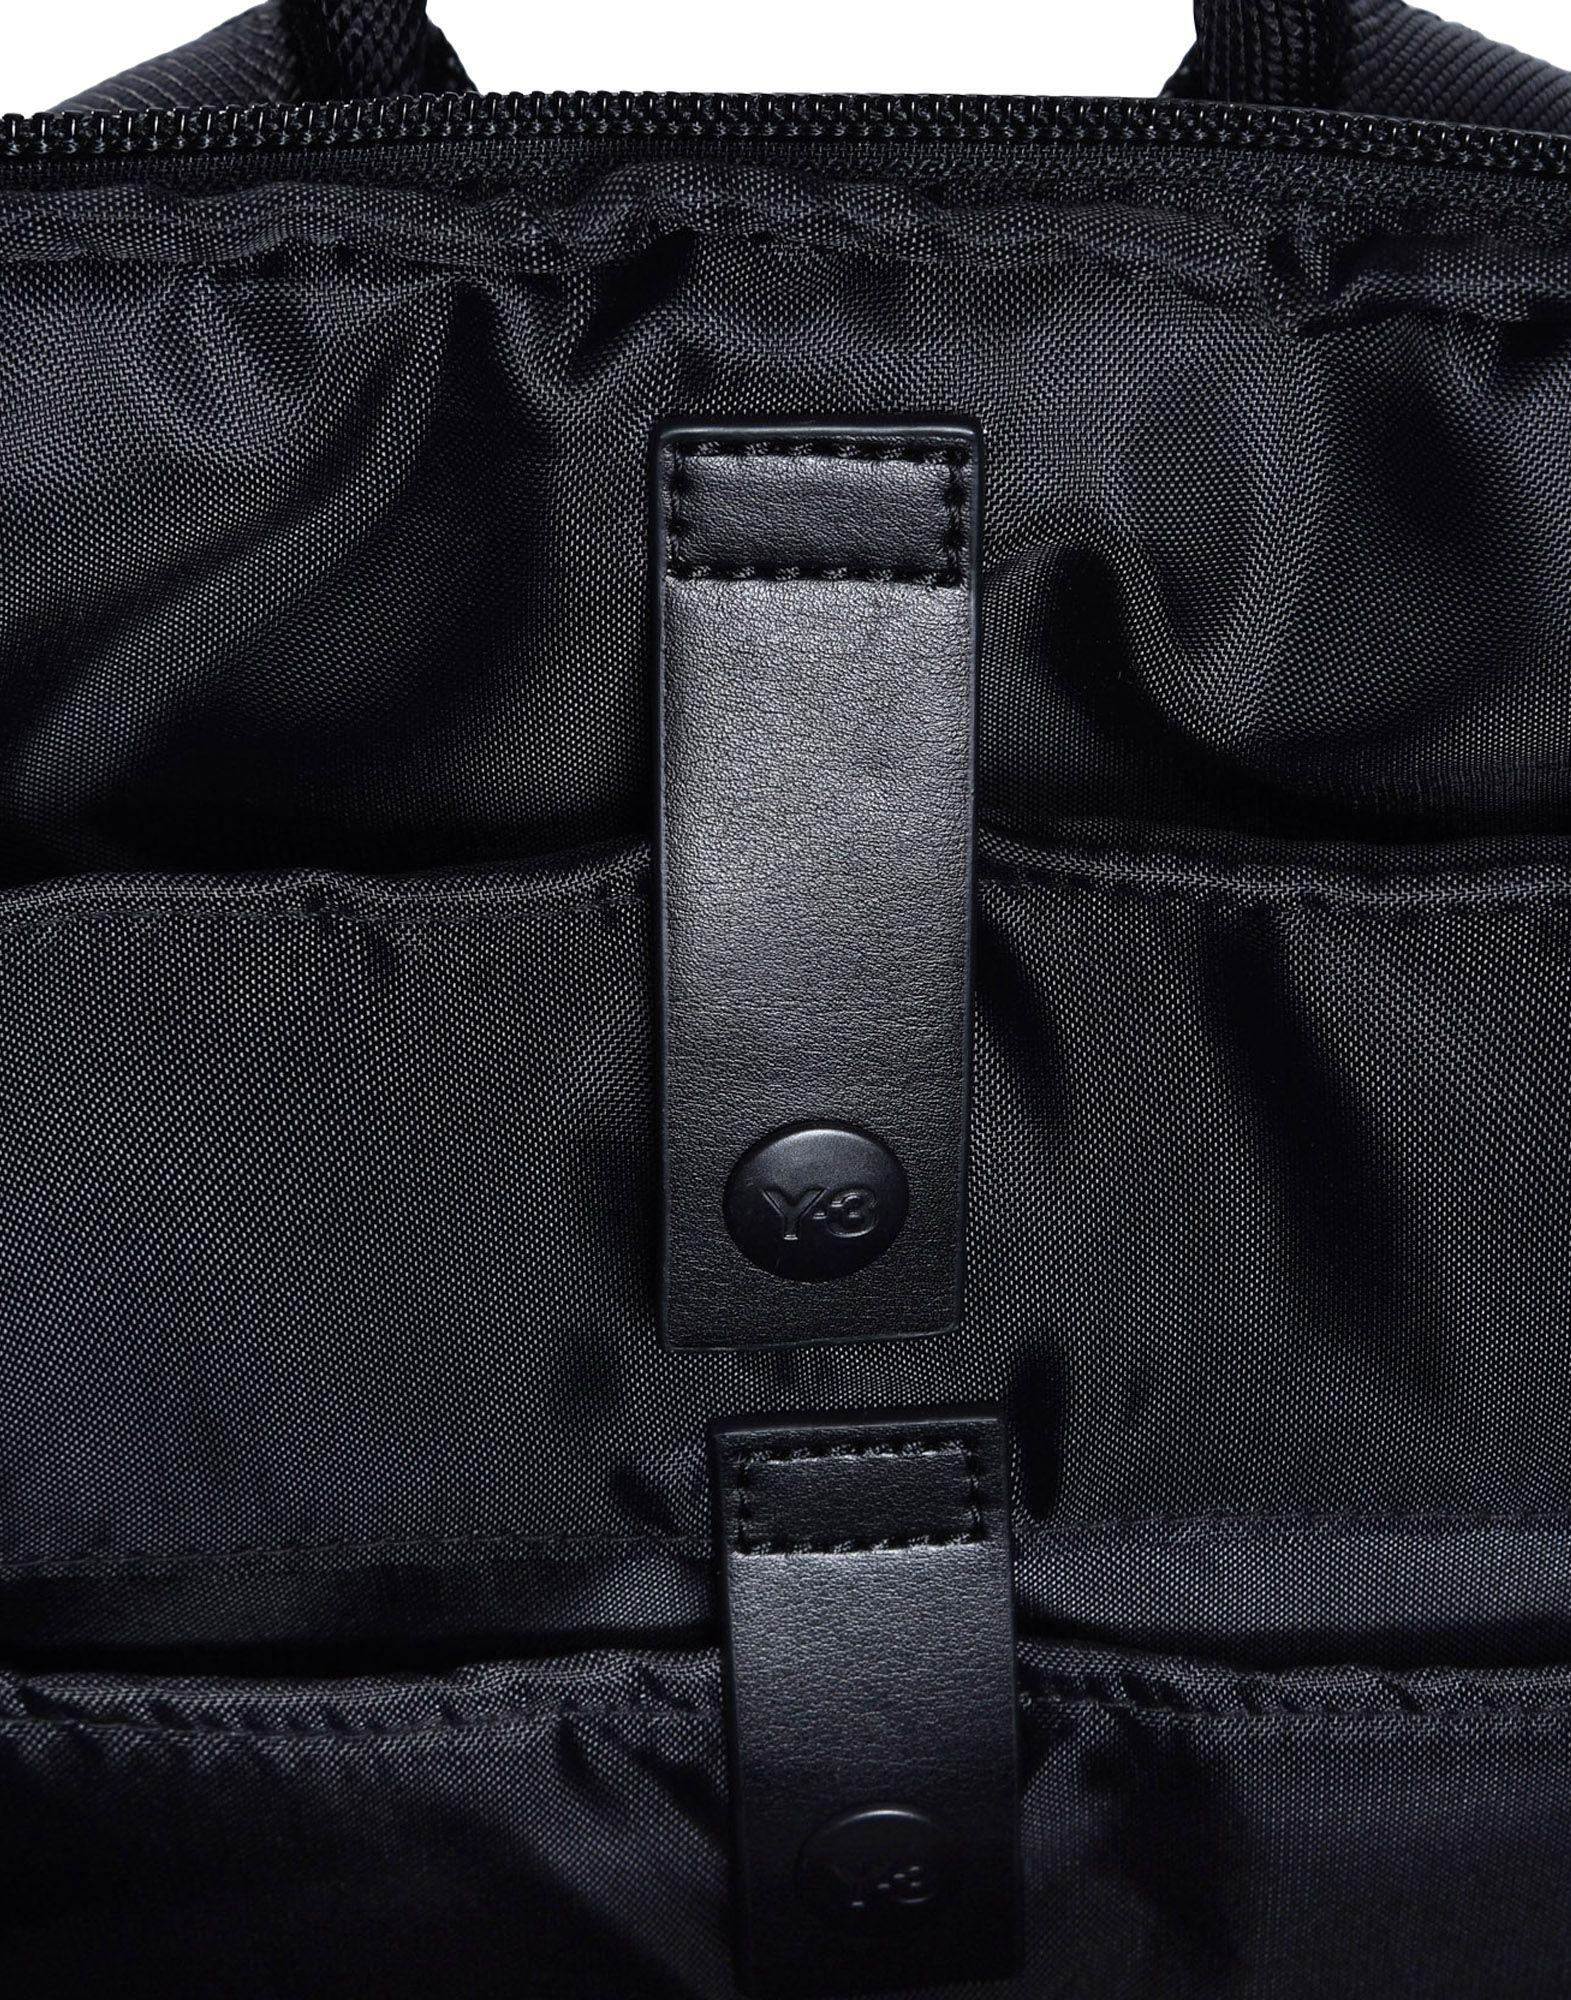 c7e5b6e95f61 Y-3 Y-3 QASA BACKPACK SMALL Backpack E a ...